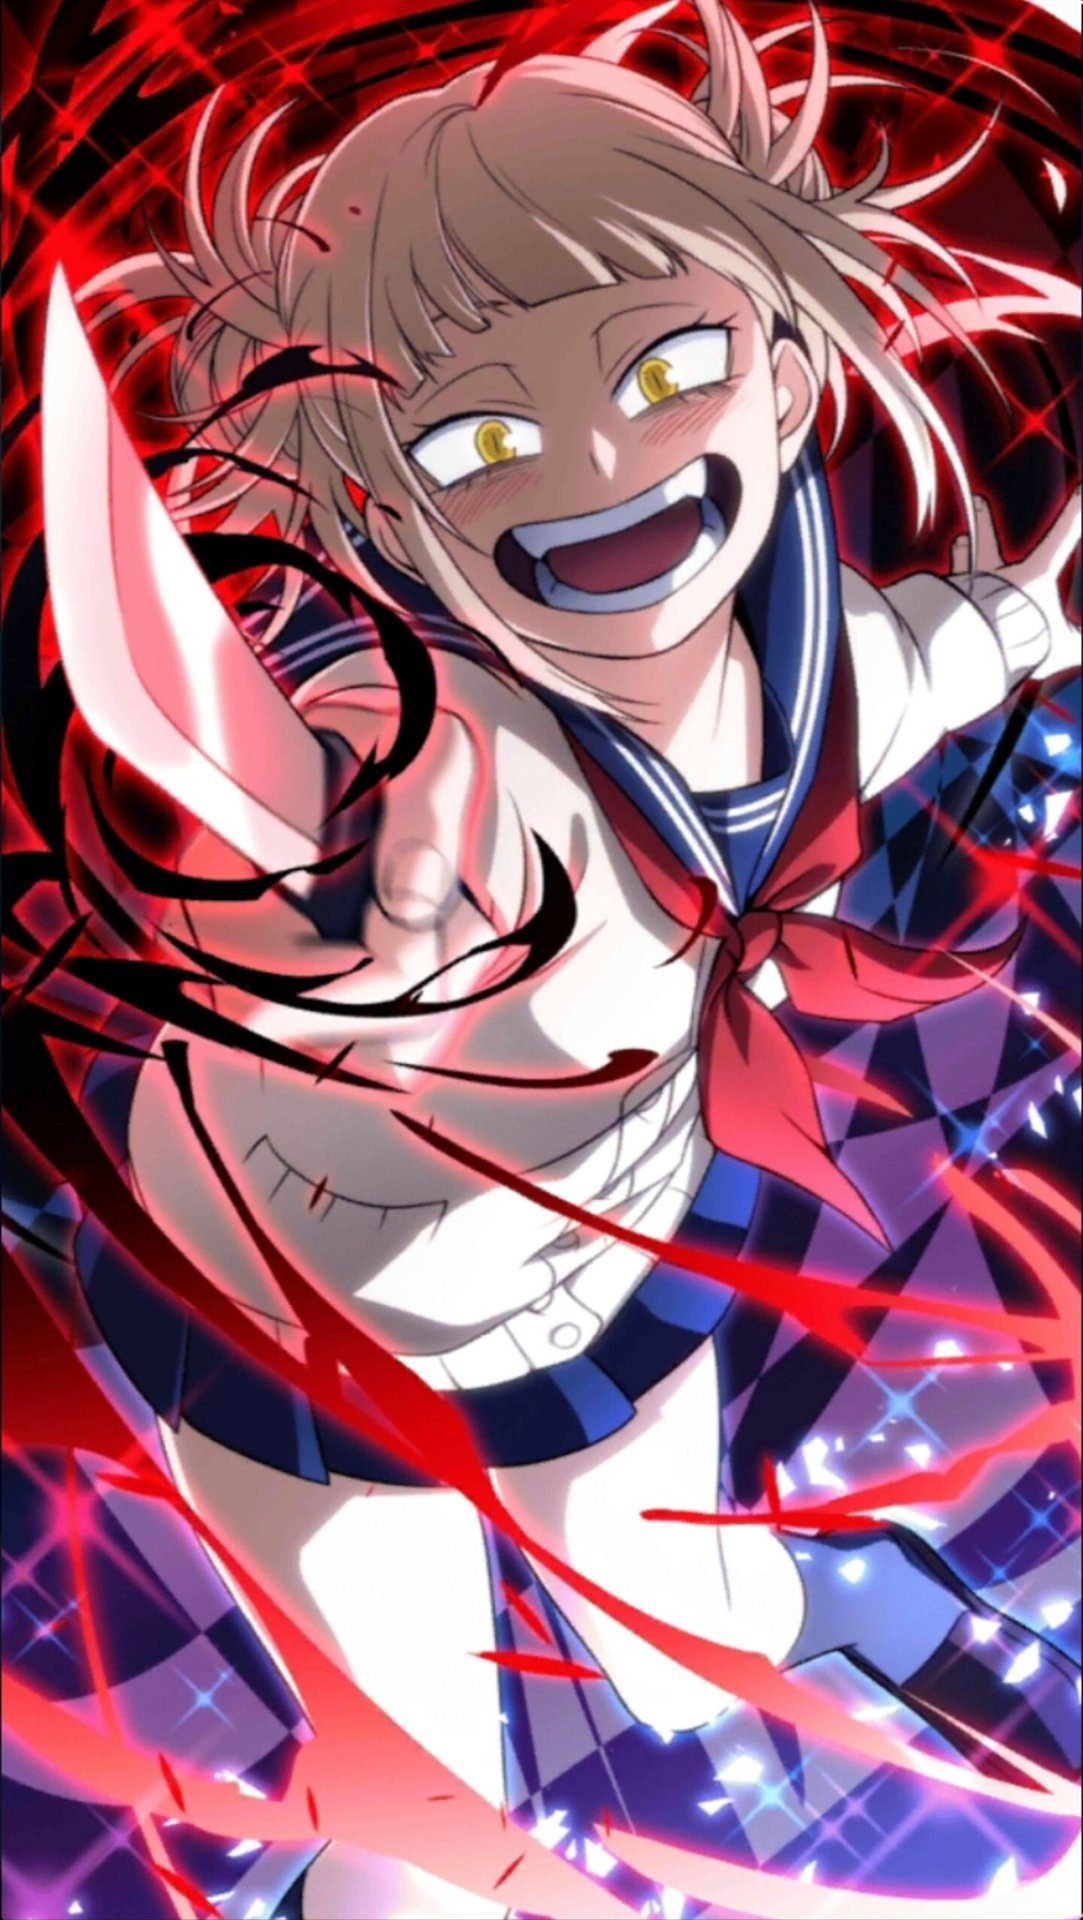 Toga Himiko Boku No Hero Academia Zerochan Anime Image Board